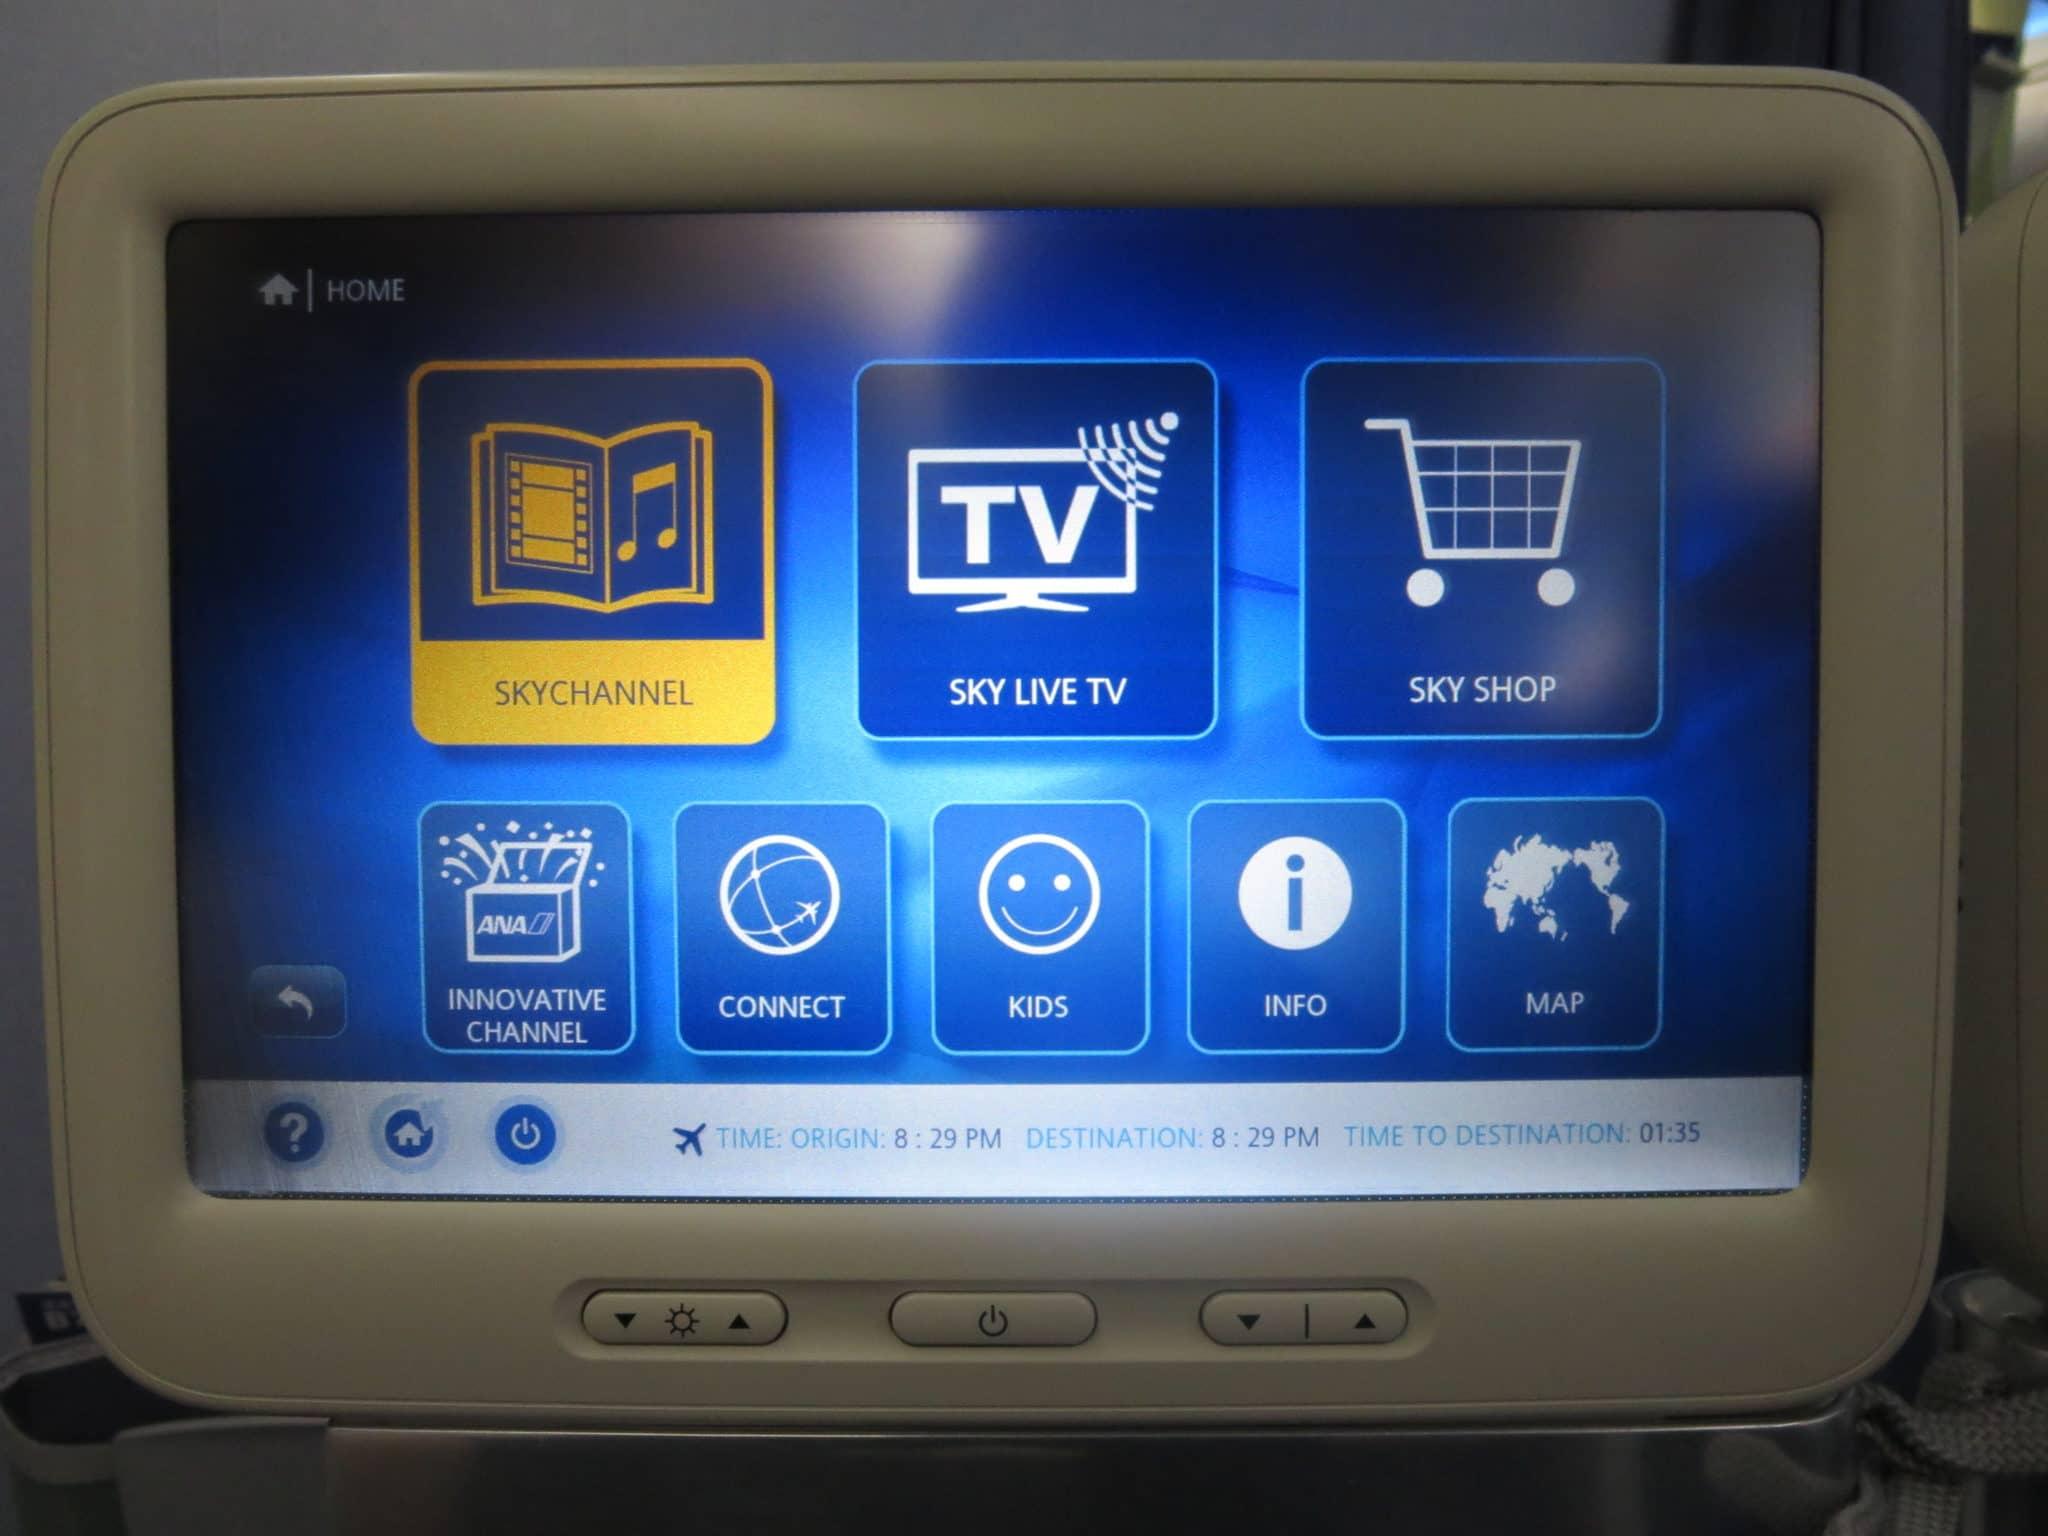 ANA Business Class 787-8 Entertainment